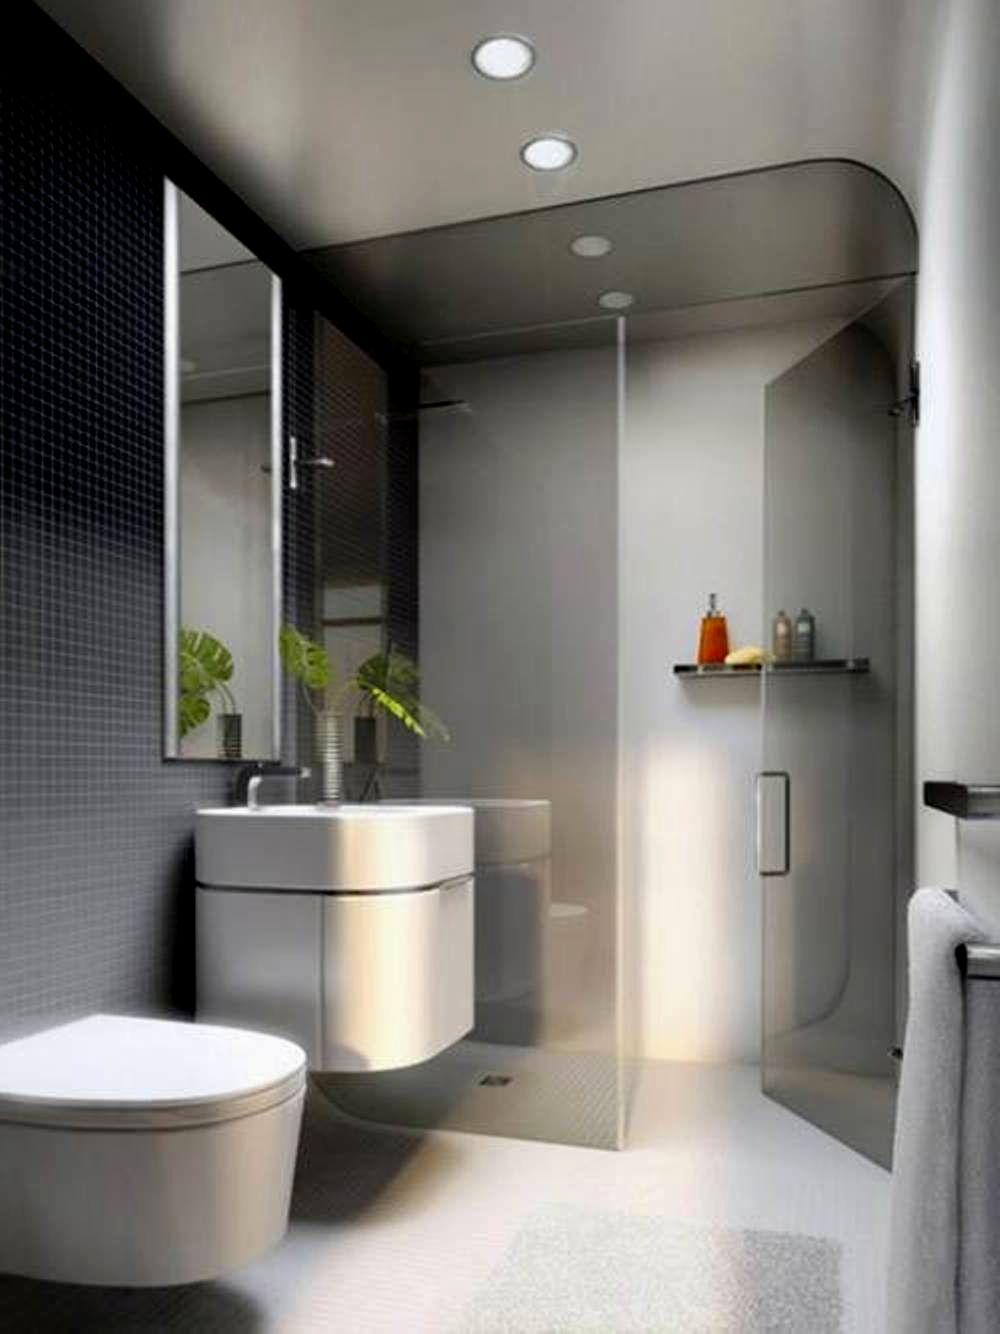 wonderful vanities for bathroom design-Sensational Vanities for Bathroom Concept